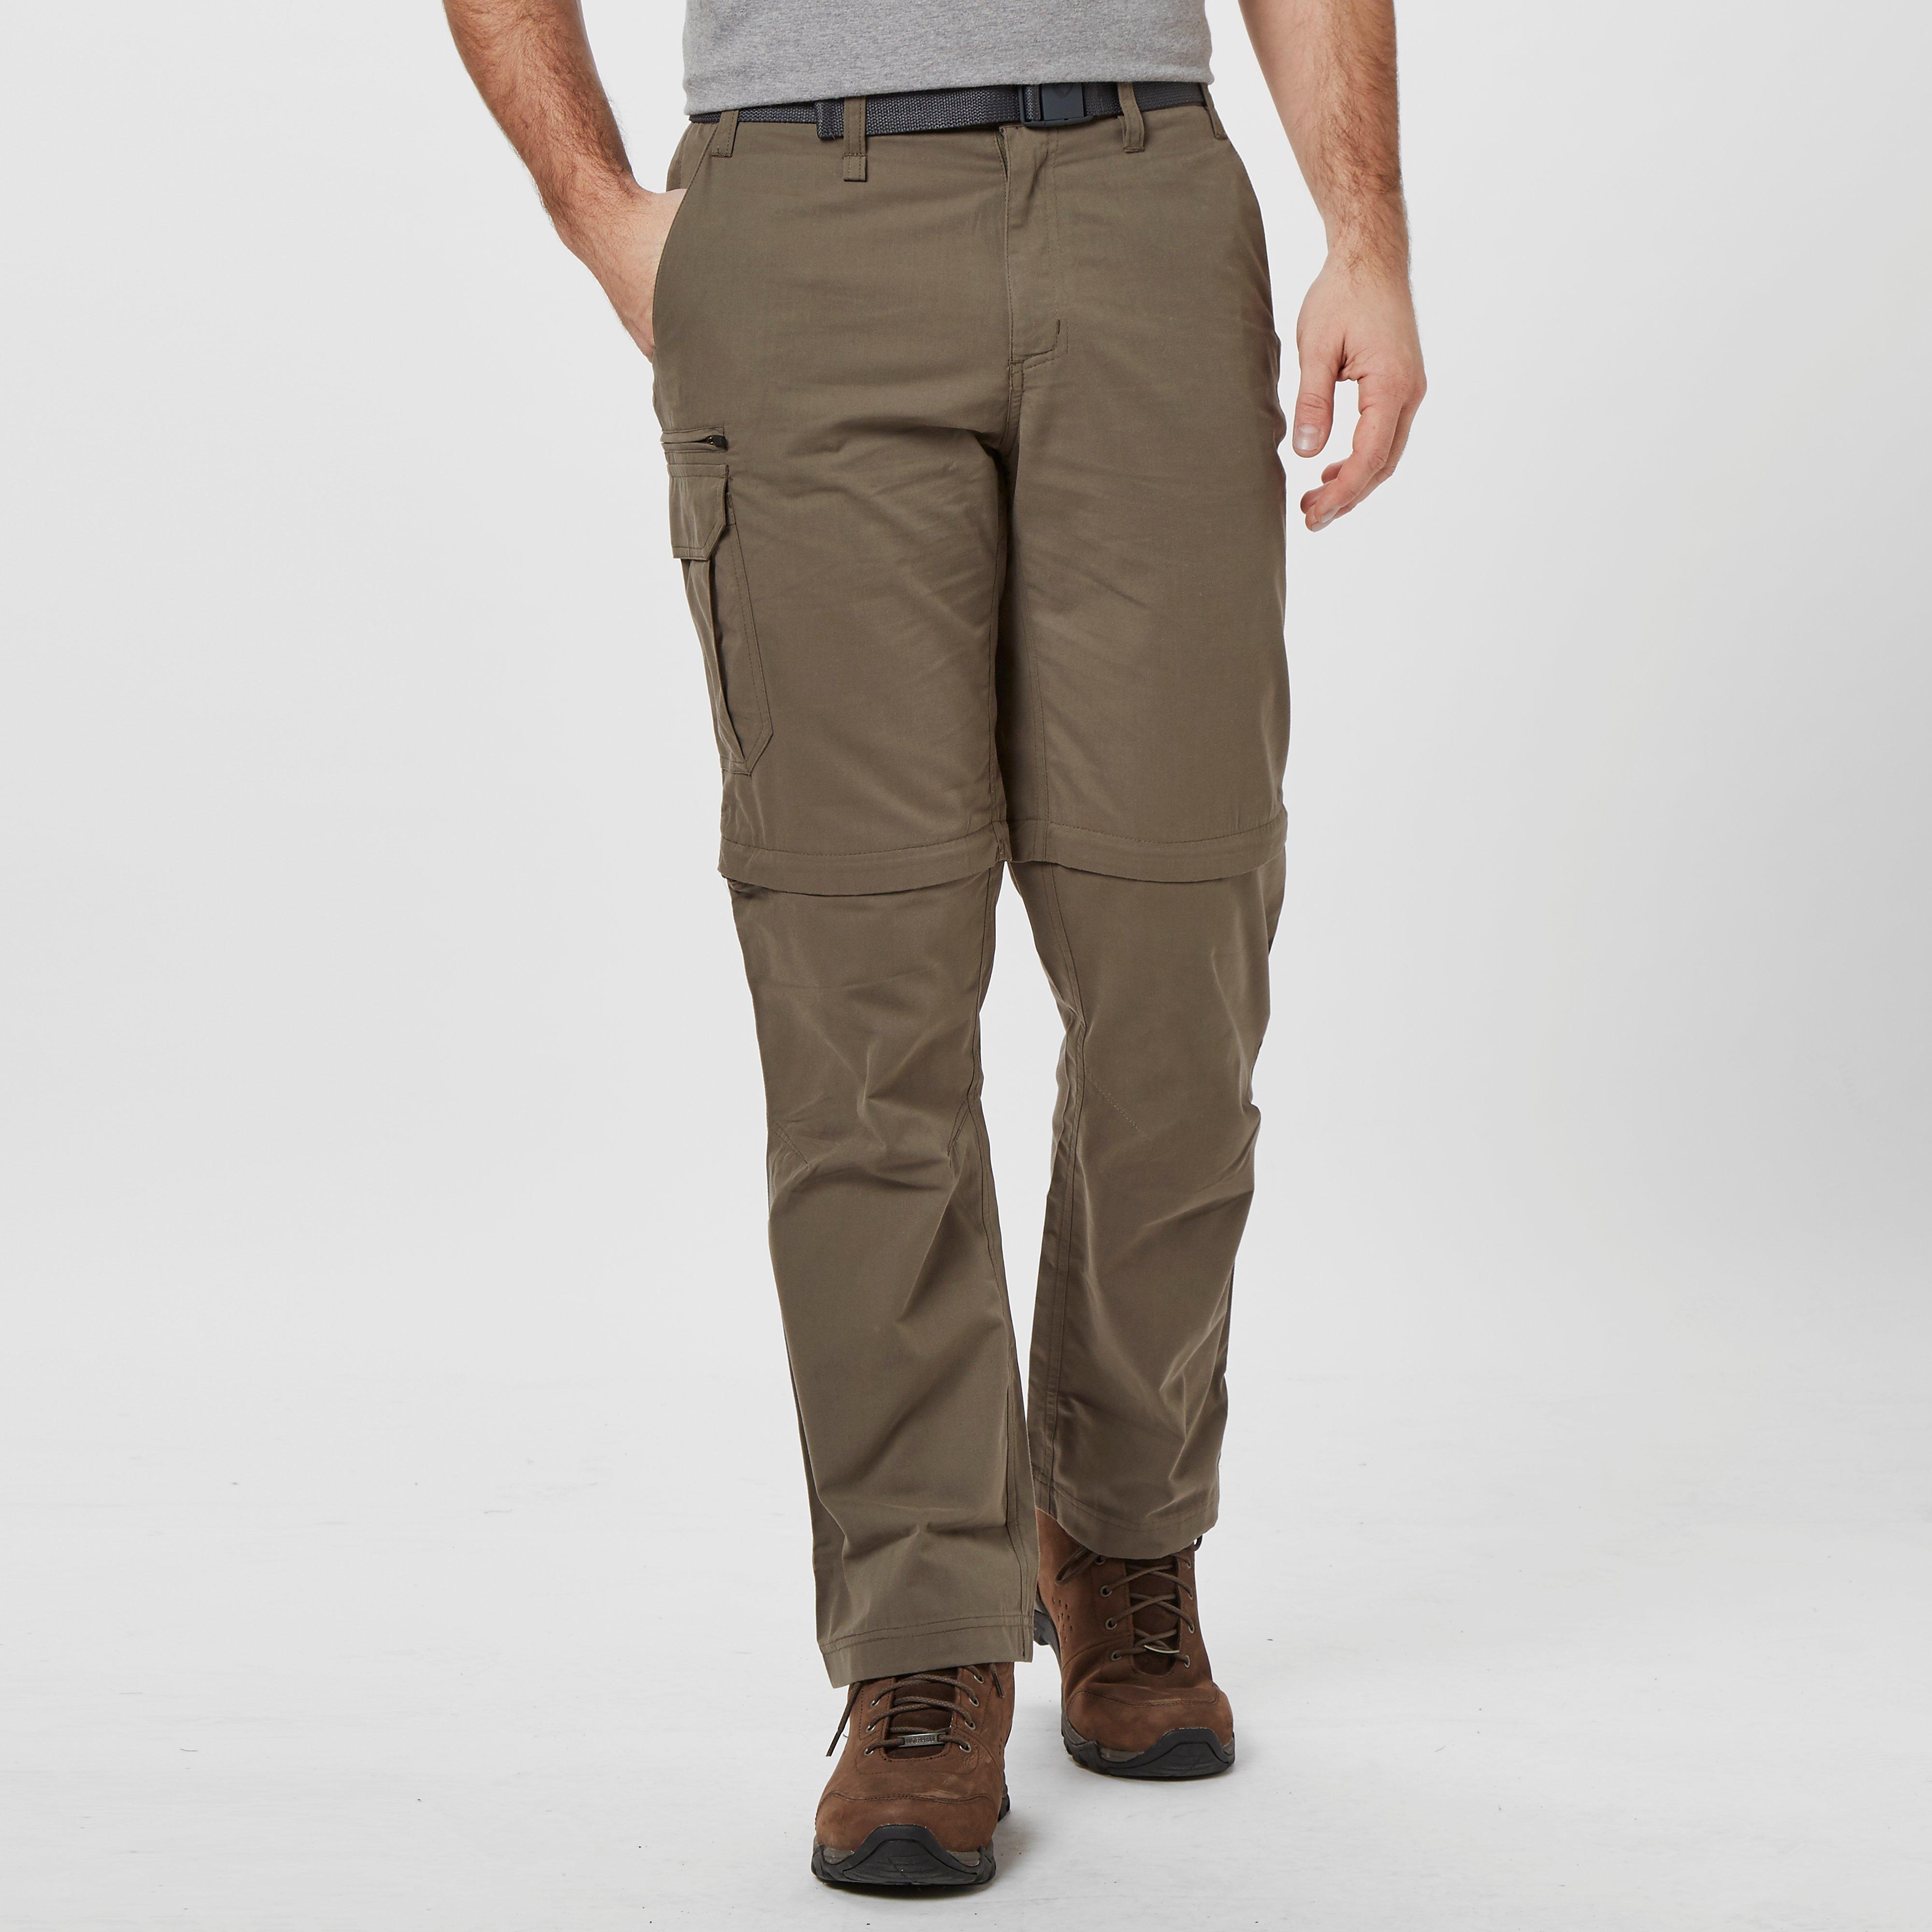 Brasher Brasher Mens Convertible Trouser - Brown, Brown